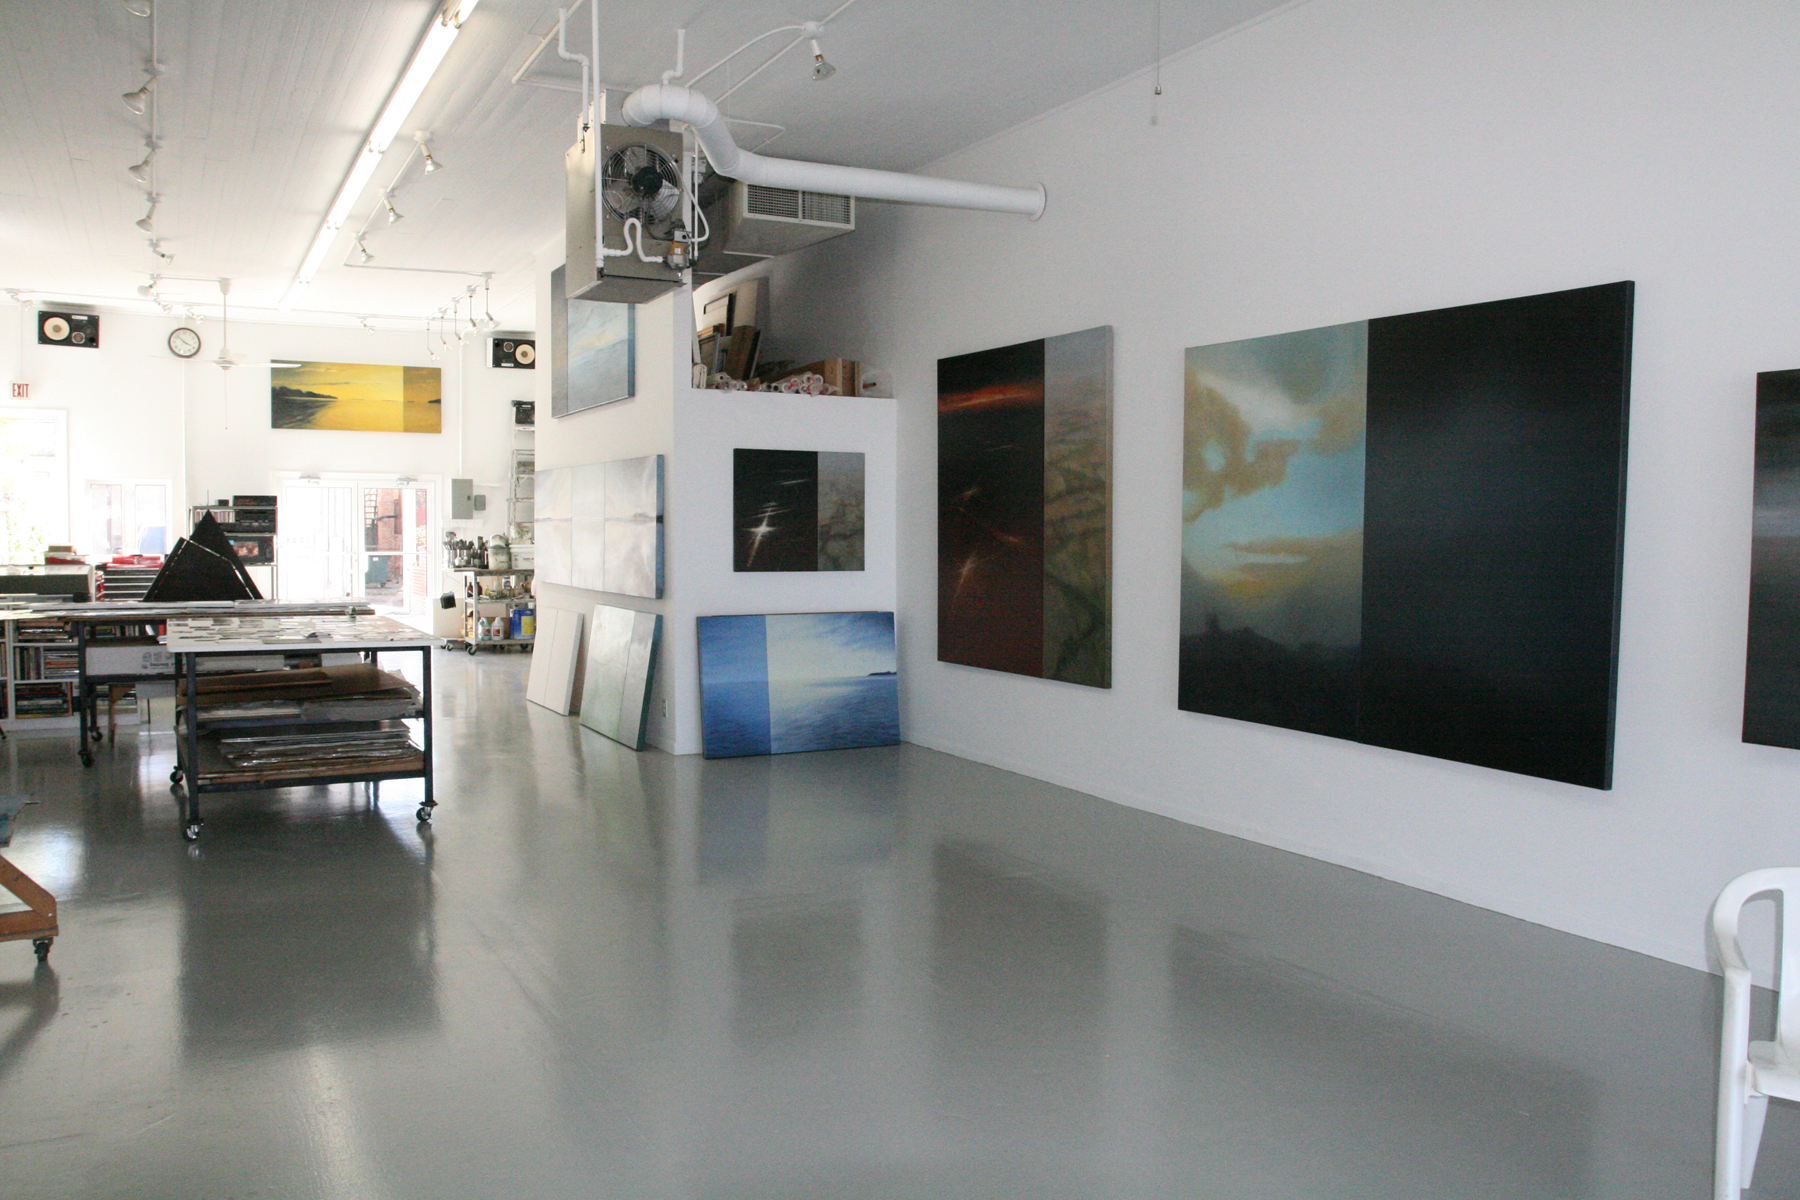 Doug's studio